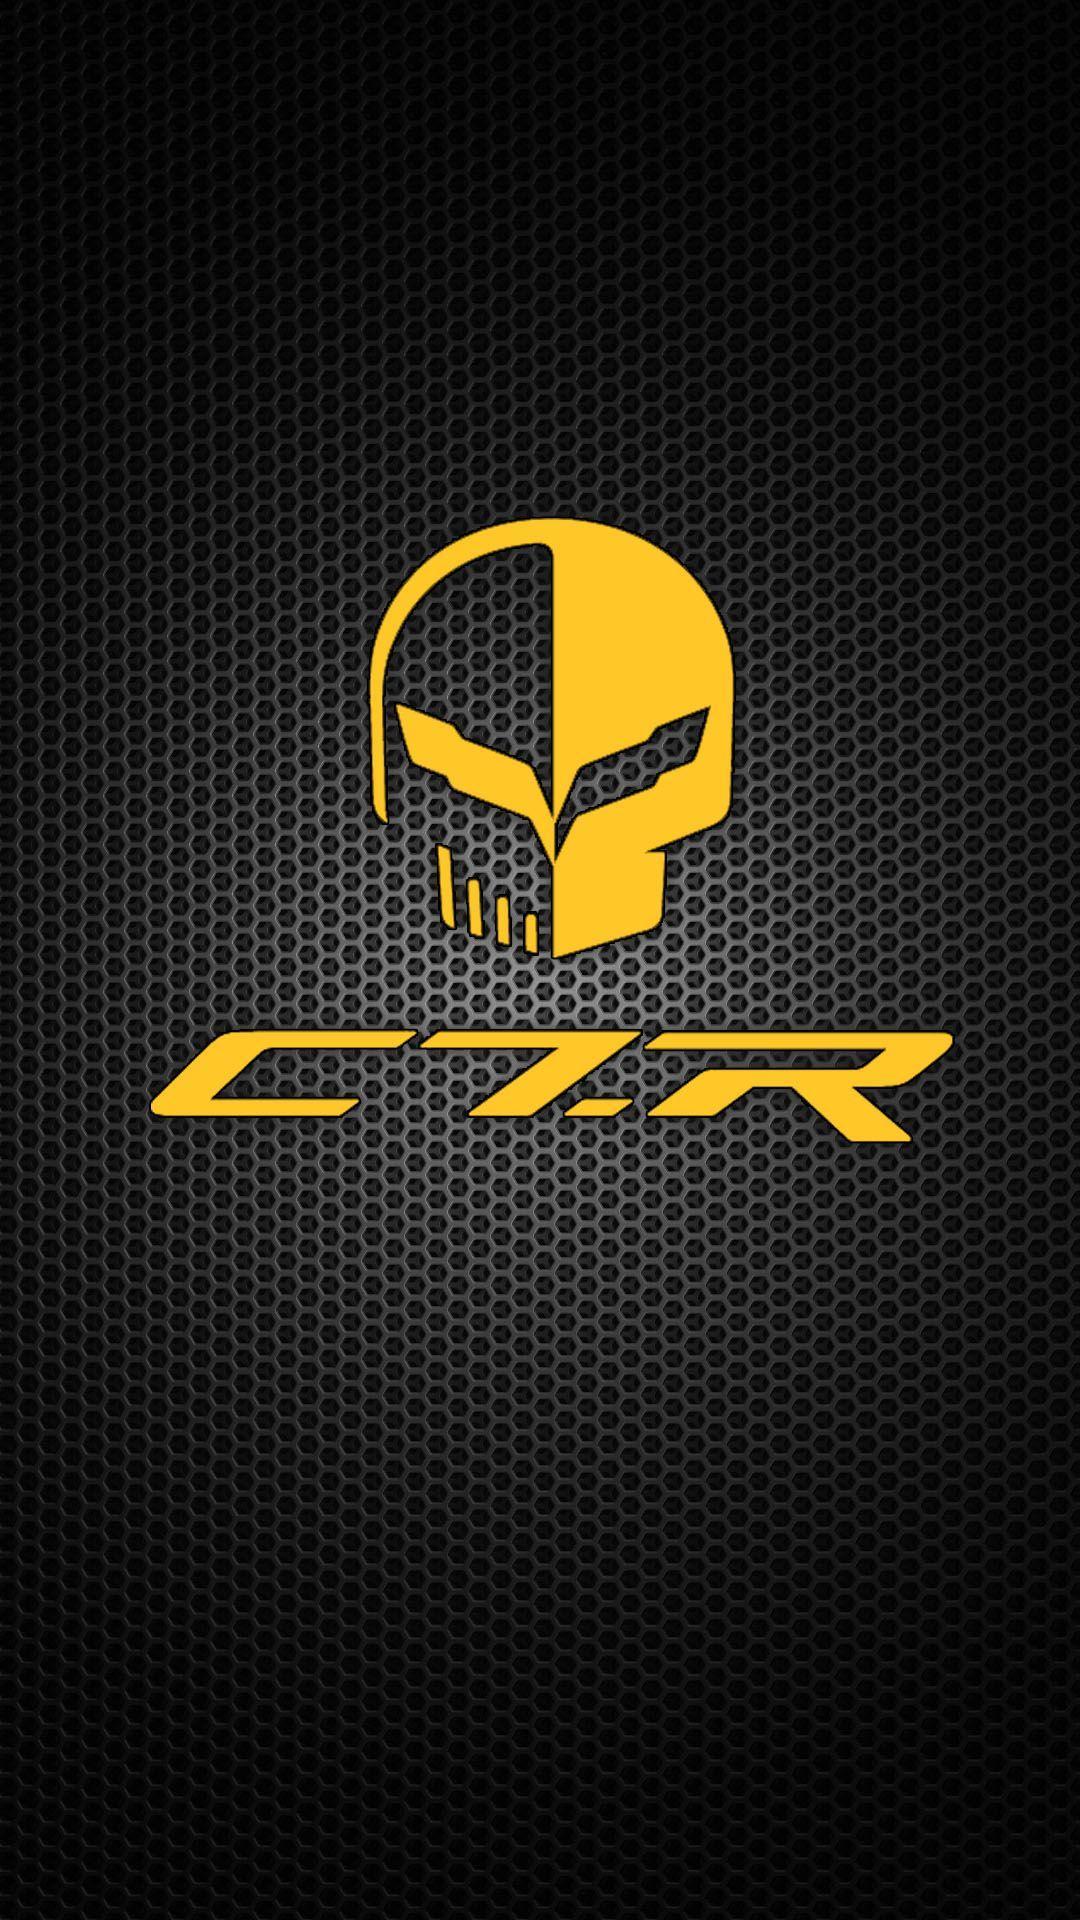 Corvette Phone Wallpapers Top Free Corvette Phone Backgrounds